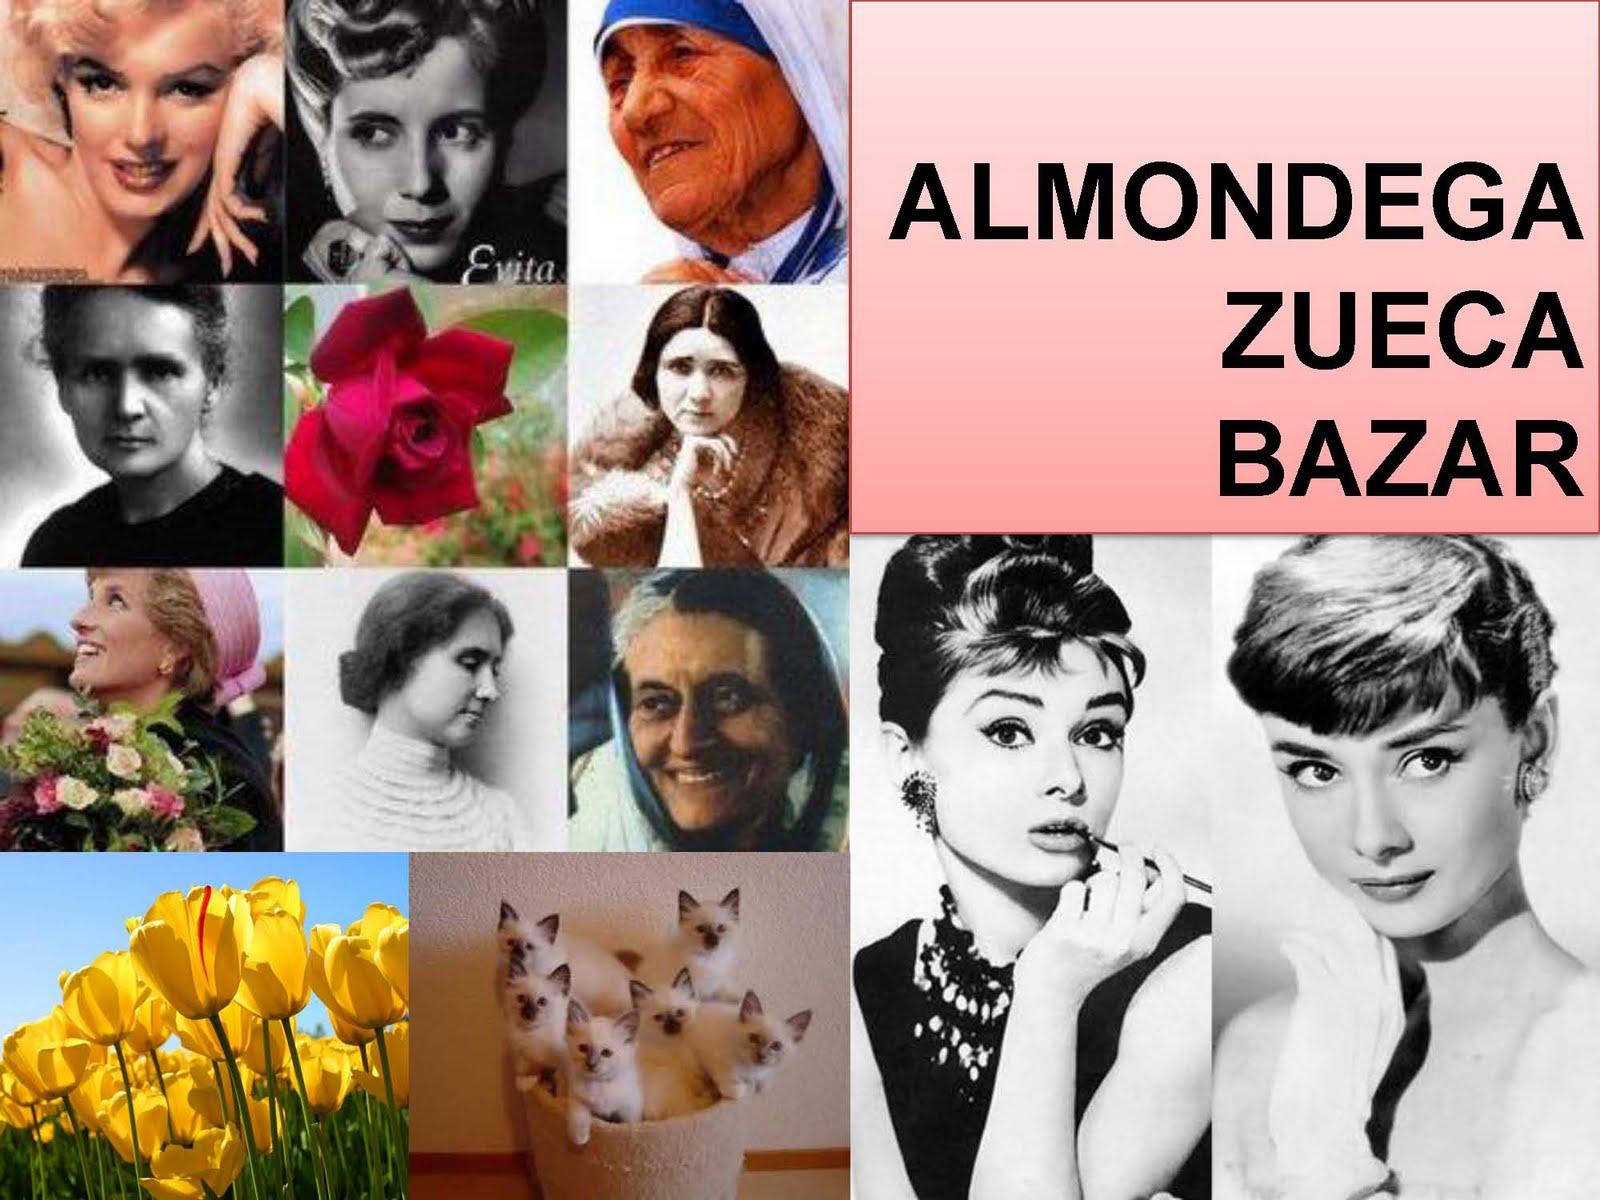 Almondega Zueca Bazar